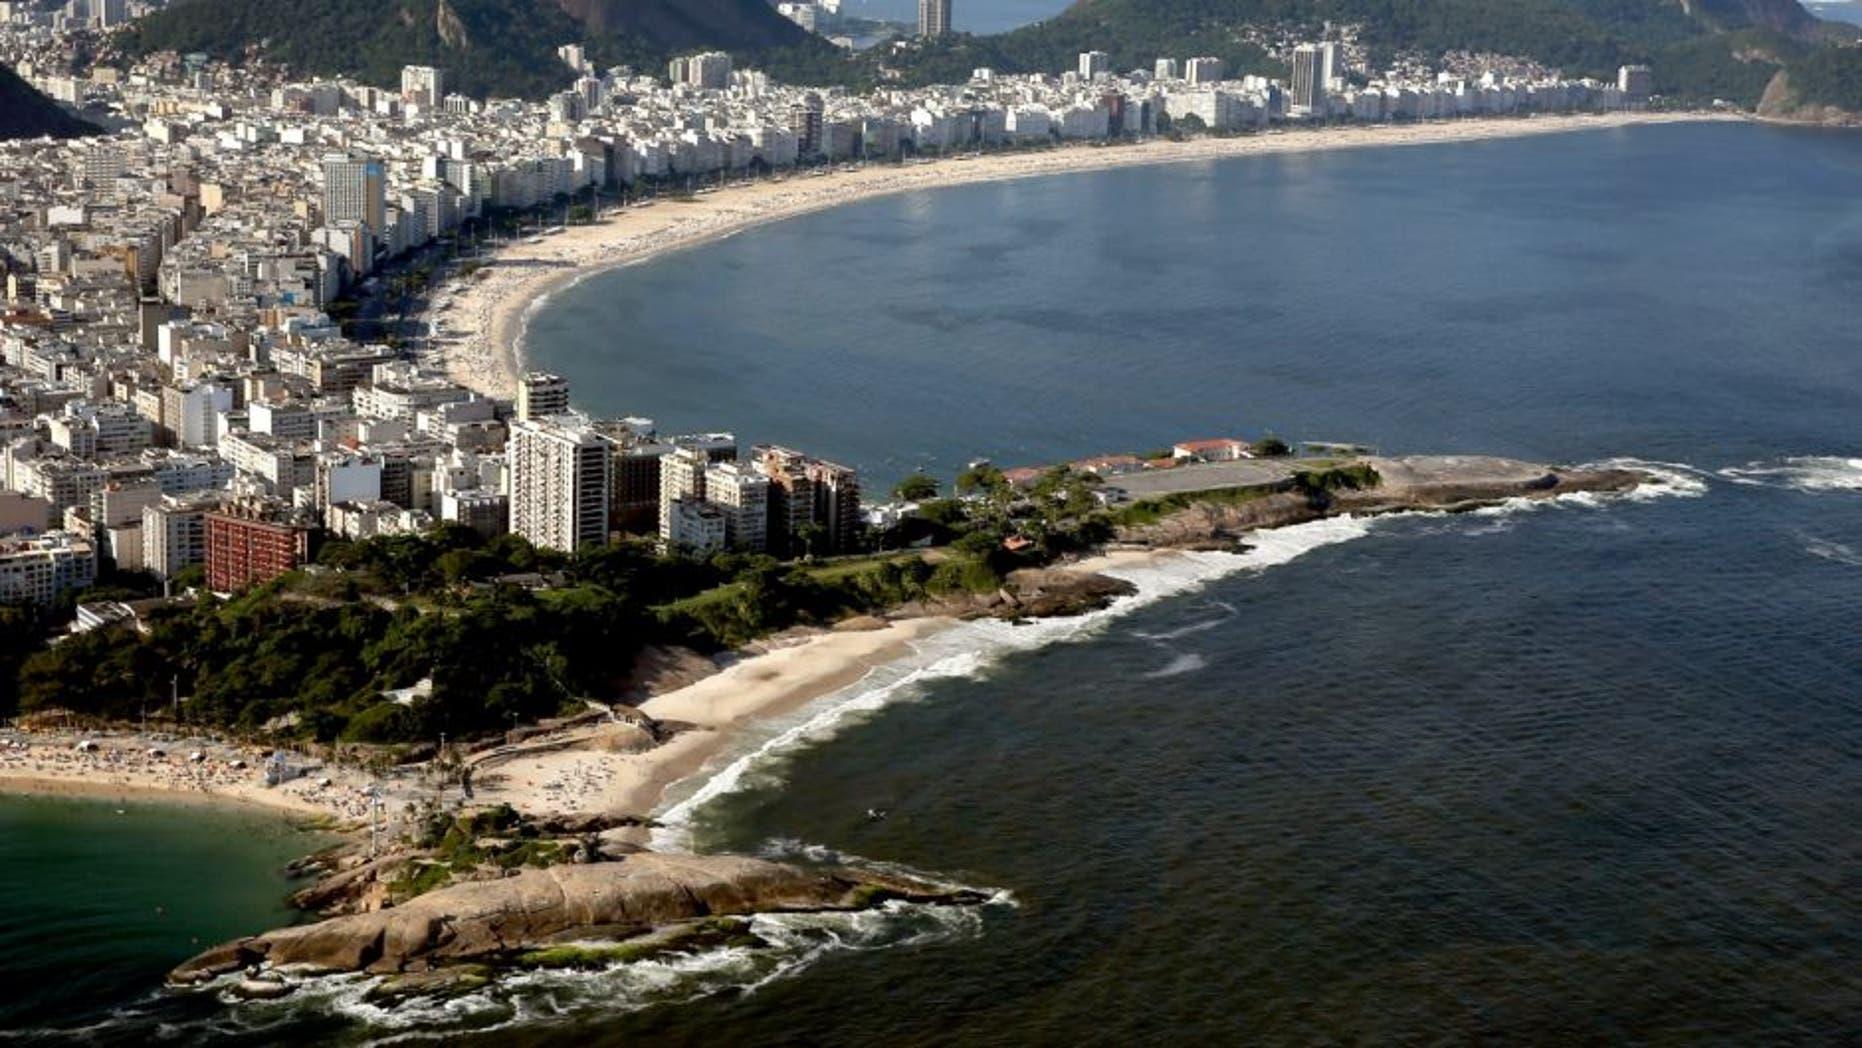 > on February 5, 2016 in Rio de Janeiro, Brazil.